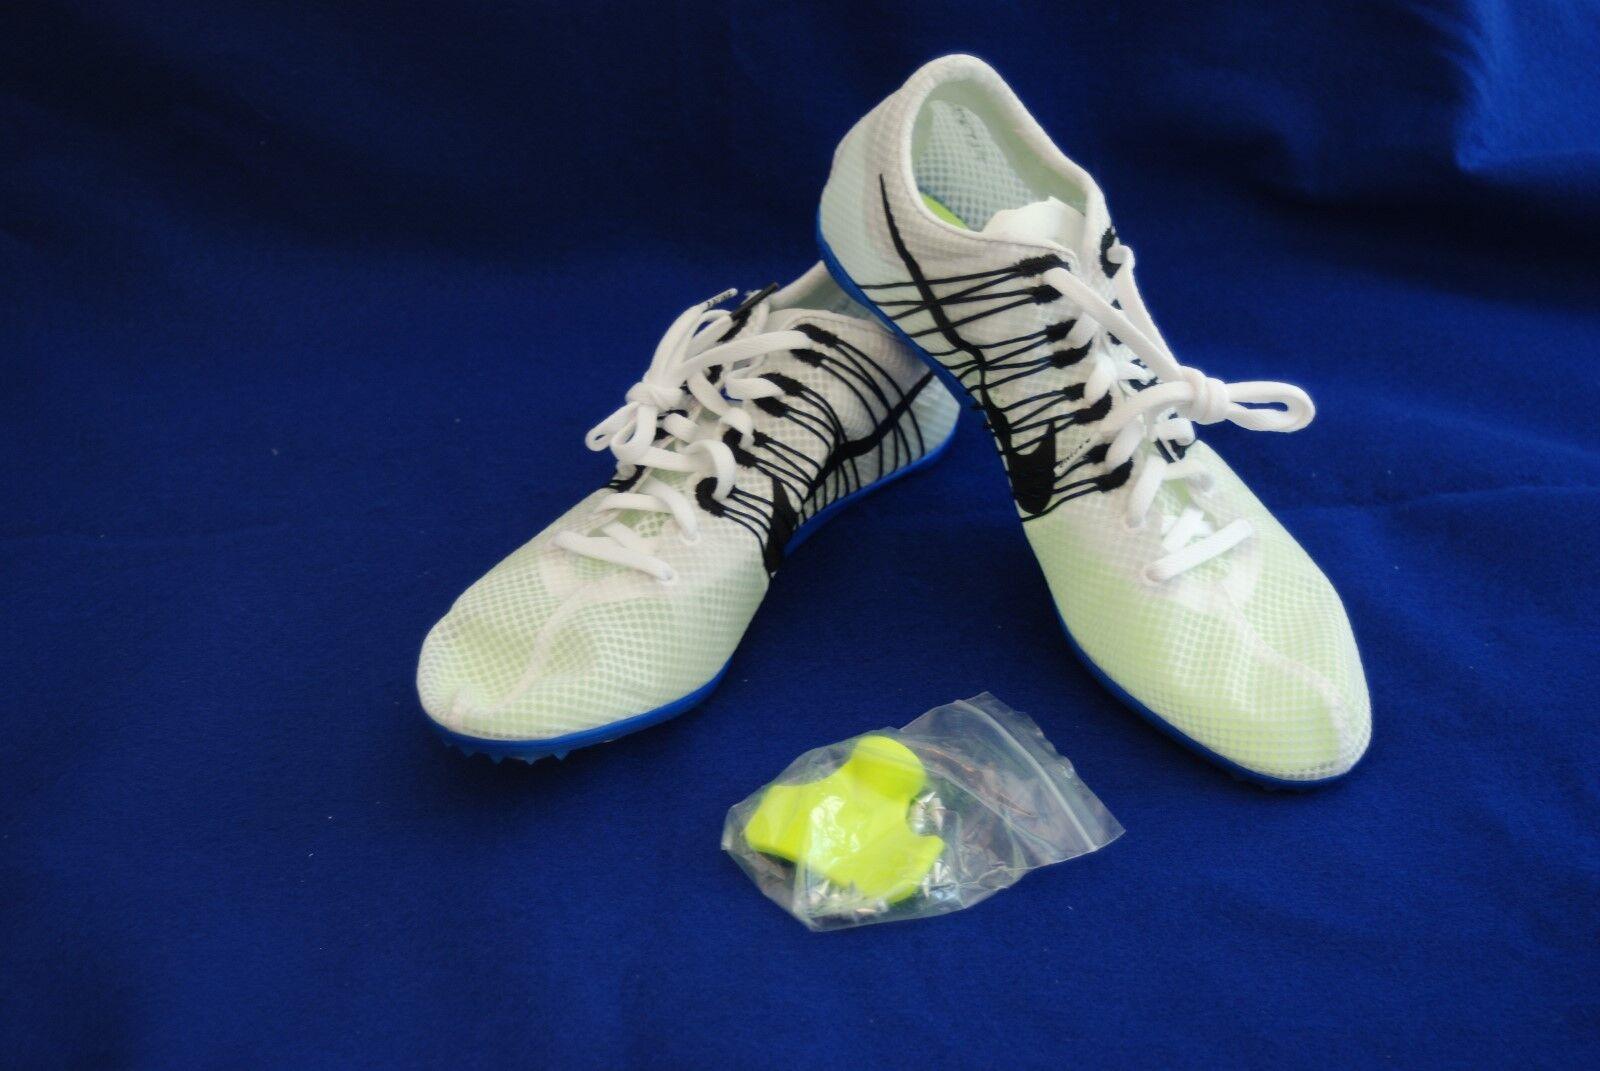 d5961793d8c9d Nike Zoom Victory 2 Hombre Track Spike unisex marca de de de descuento  555365-100 blanco negro comodo fc0374